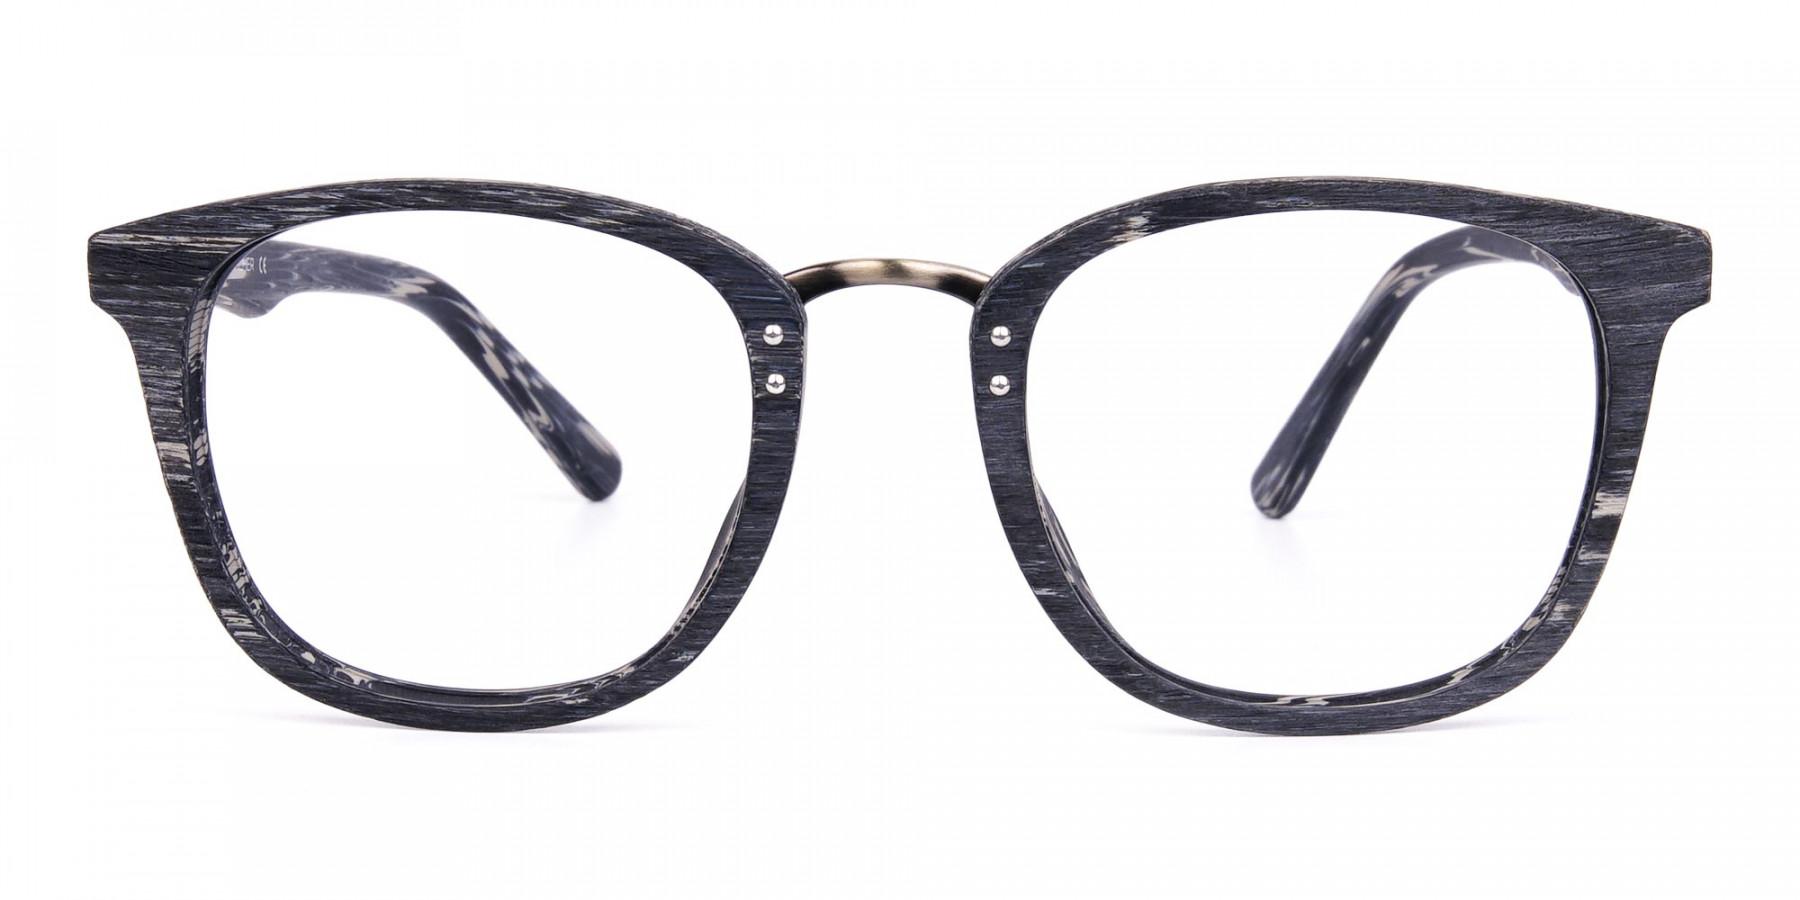 Wooden-Texture-Stripe-Grey-Rim-Glasses-1